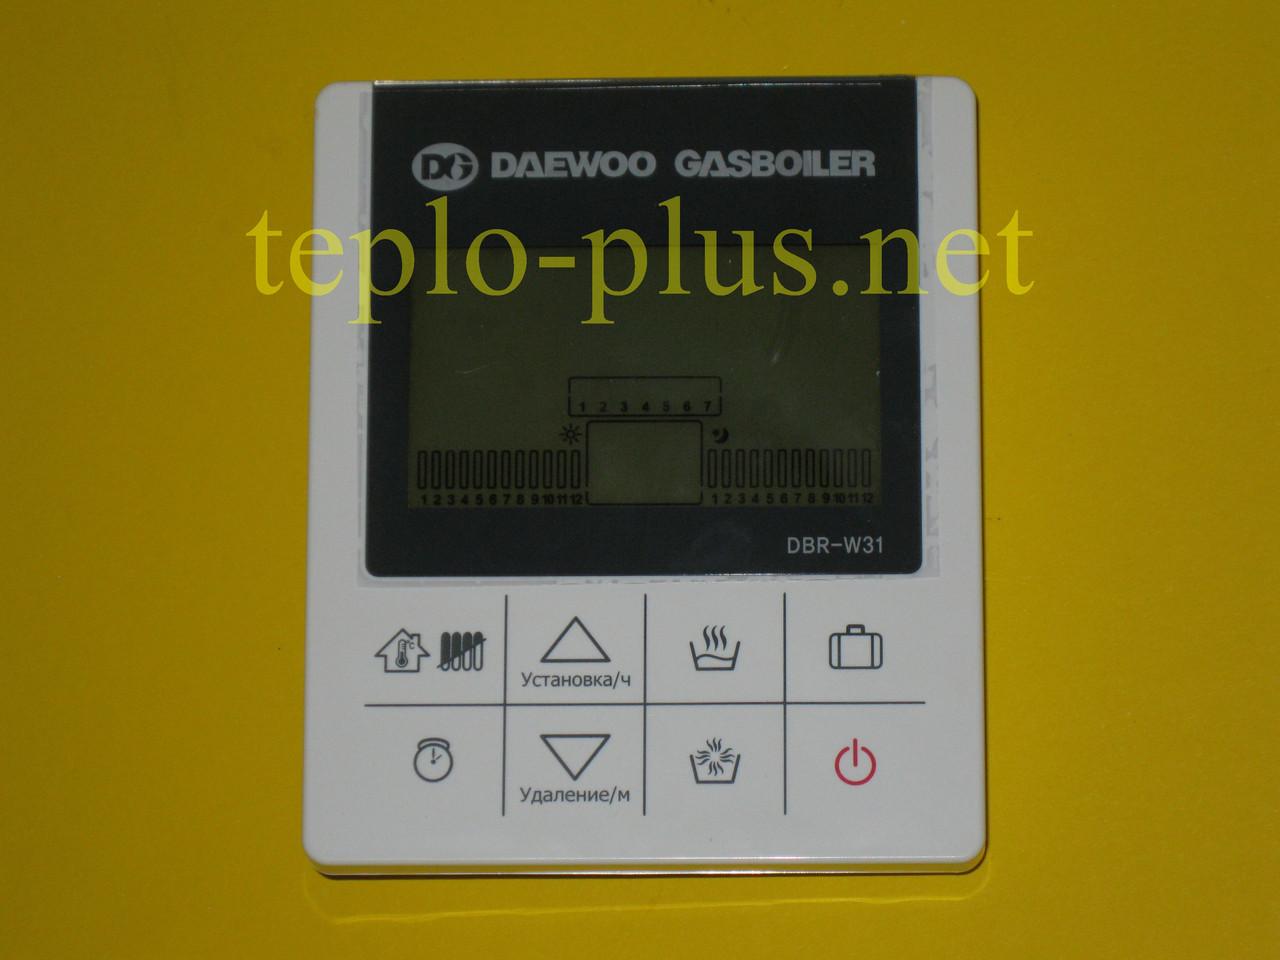 Пульт управления комнатный DBR-W31 Daewoo Gasboiler DGB-100, 130, 160, 200, 250, 300, 350 MSC/MES, 400 MSC